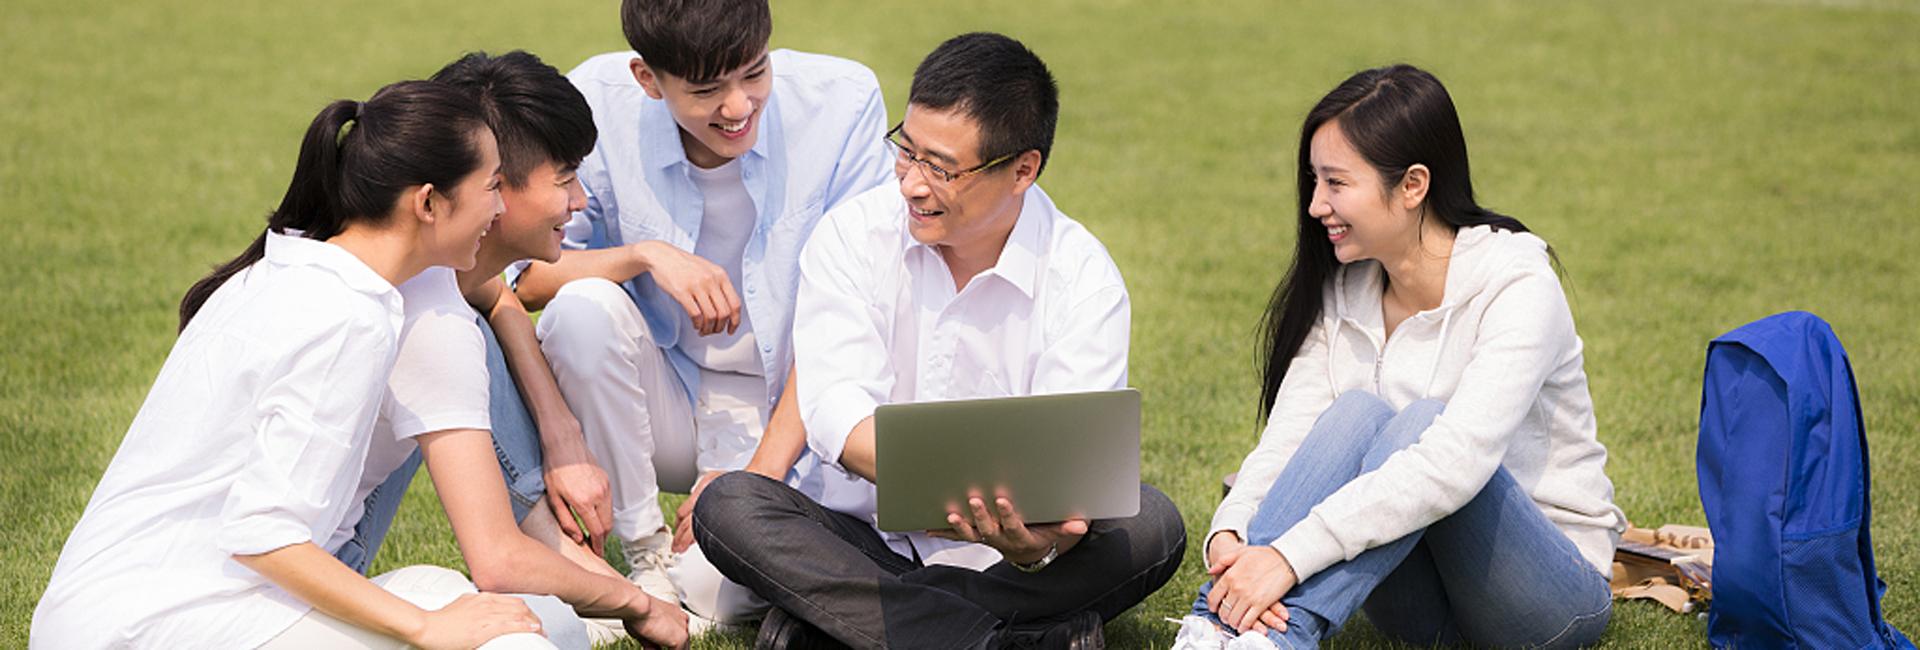 Xi extends Teachers' Day greetings to teachers